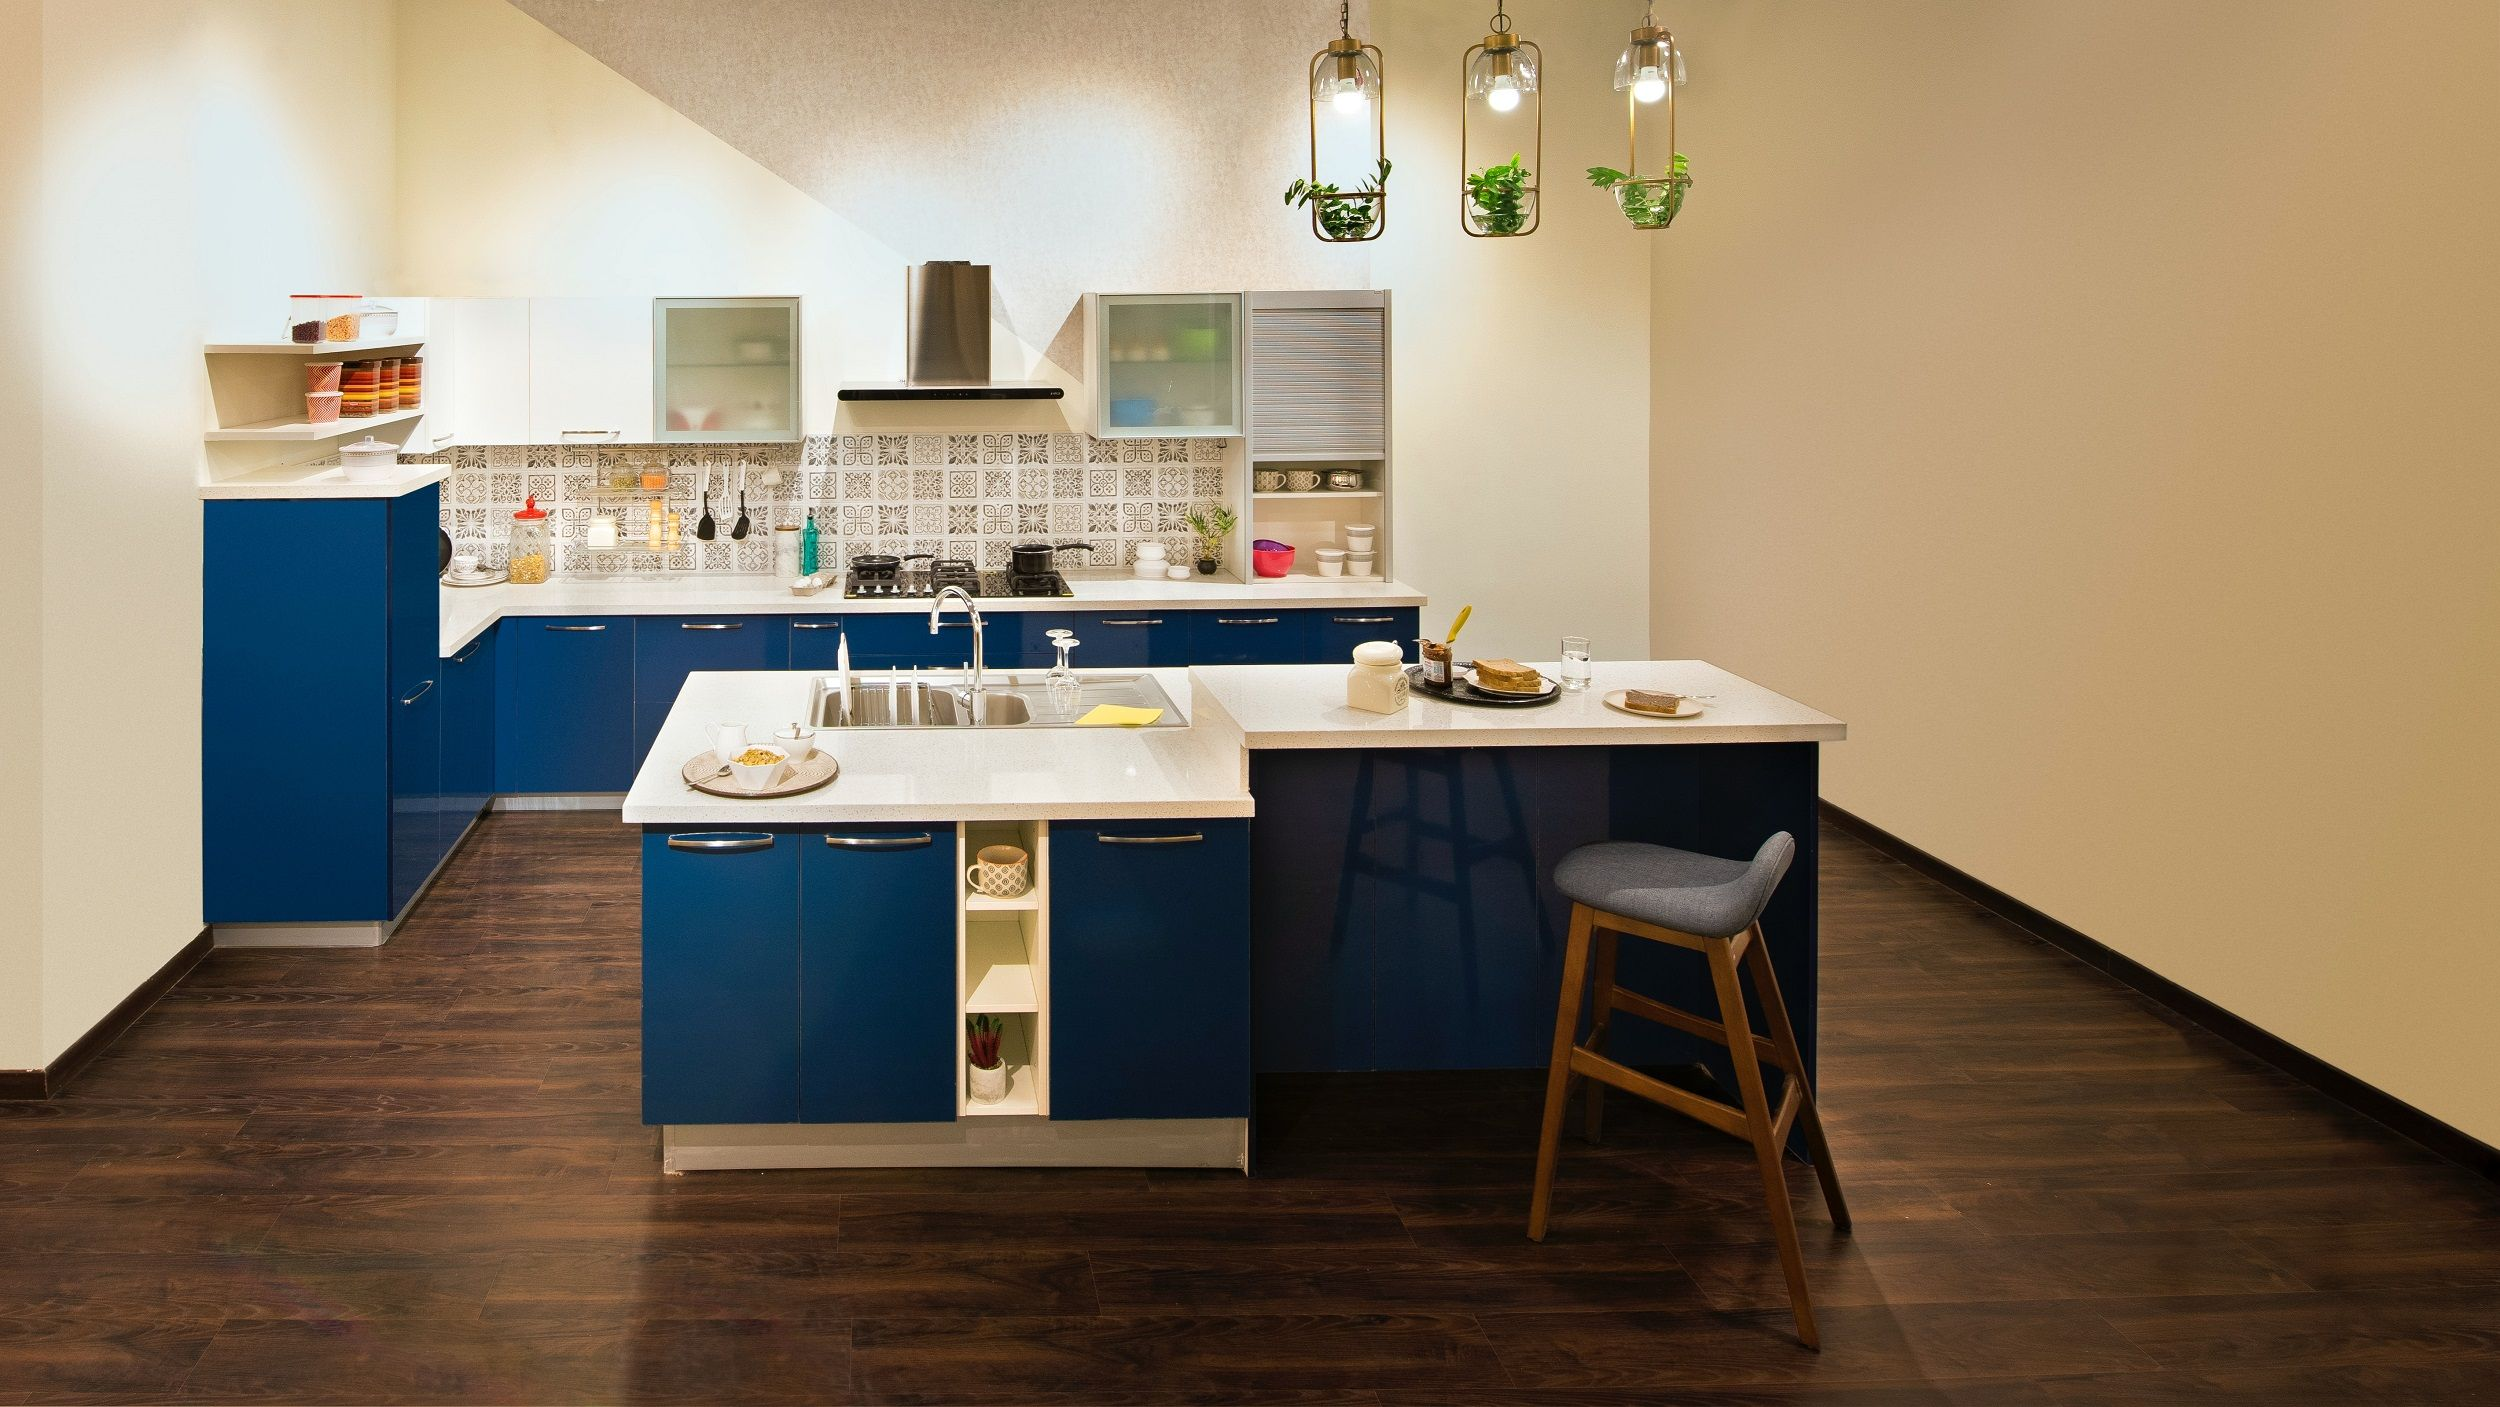 Choosing High Kitchen Cabinets In 2020 Buy Kitchen Cabinets Buy Kitchen Cabinets Online Kitchen Design